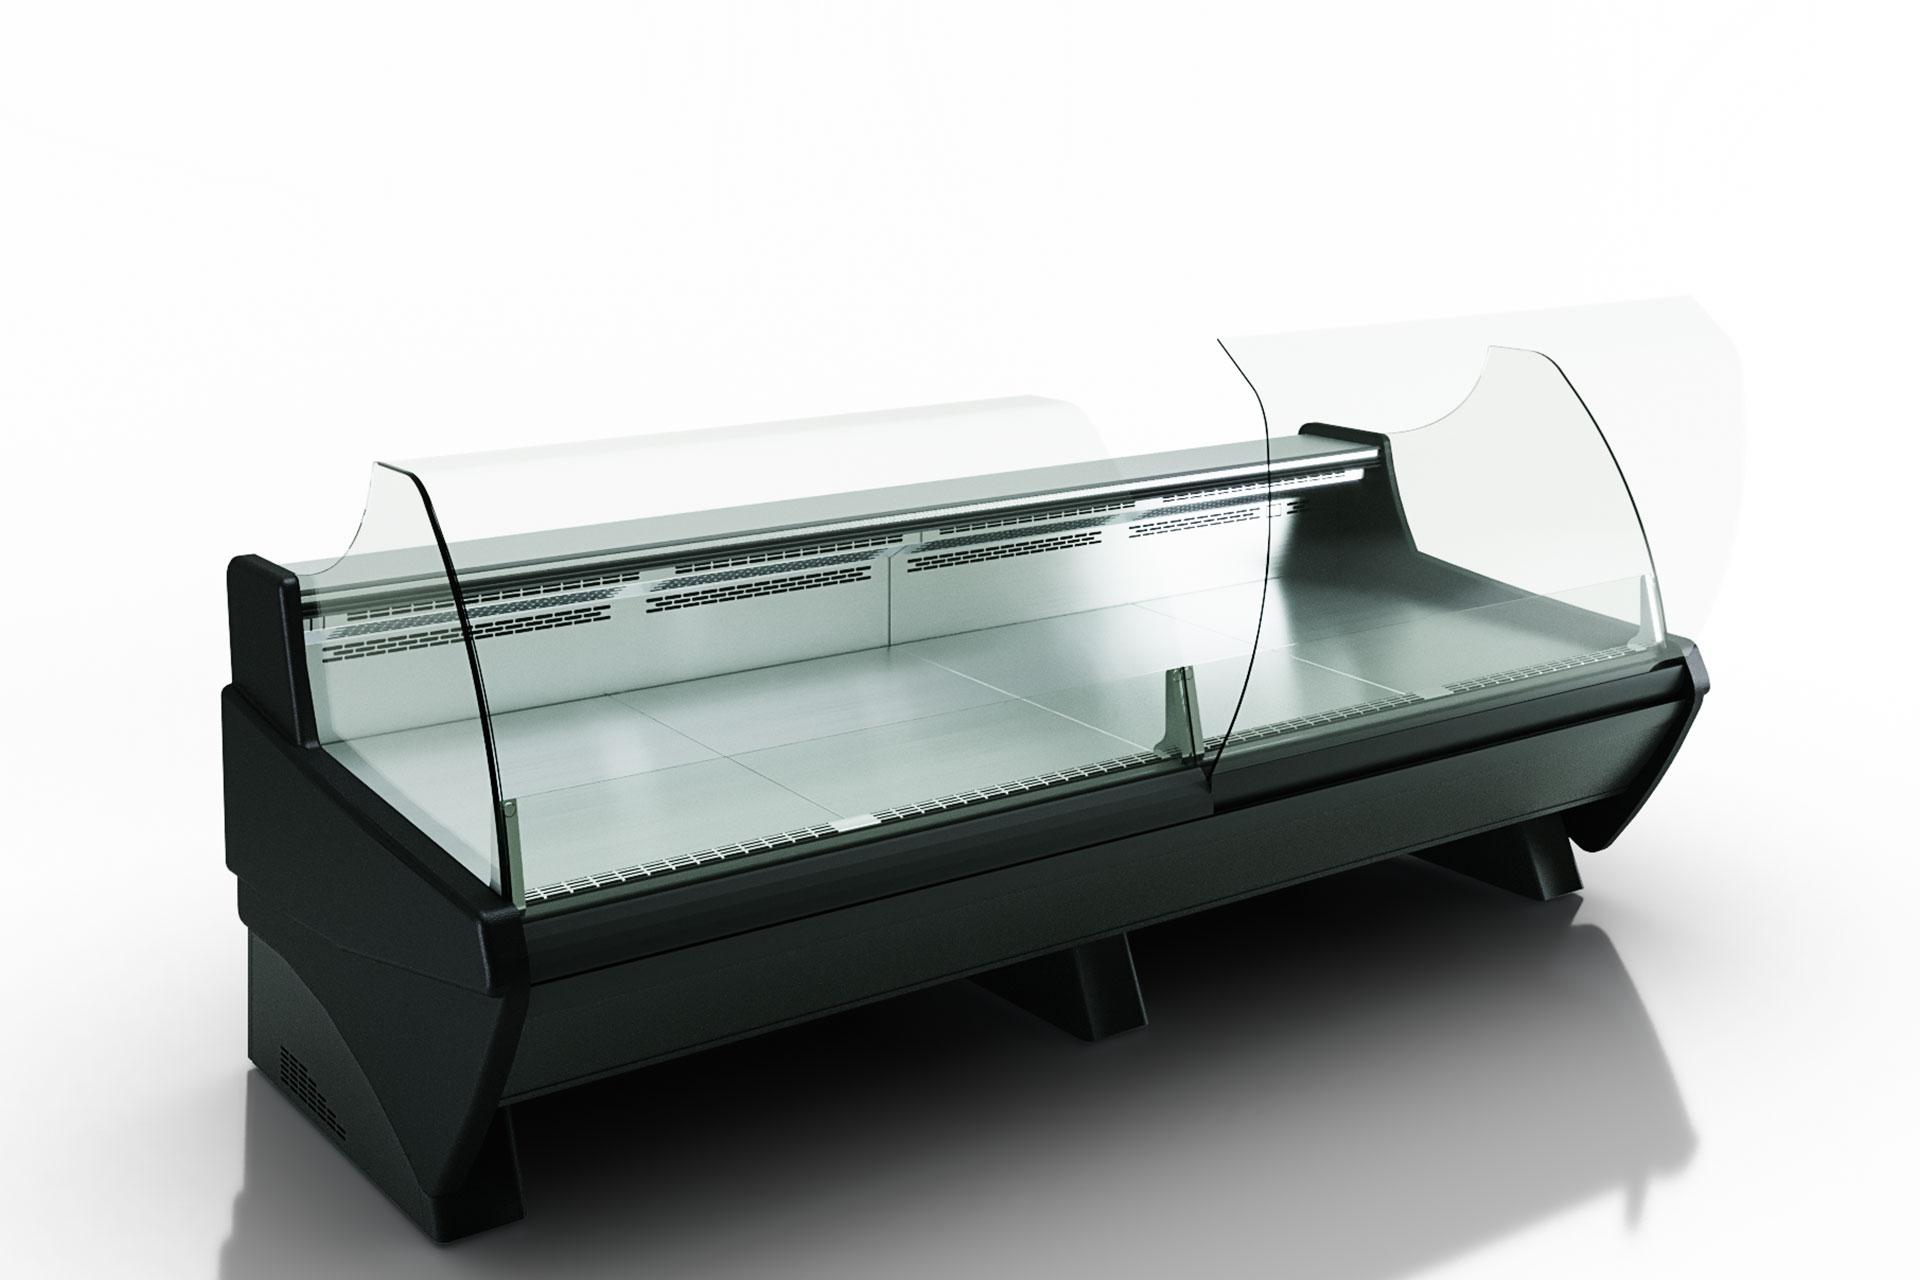 Витрина Symphony luxe MG 100 deli T 110-DLM